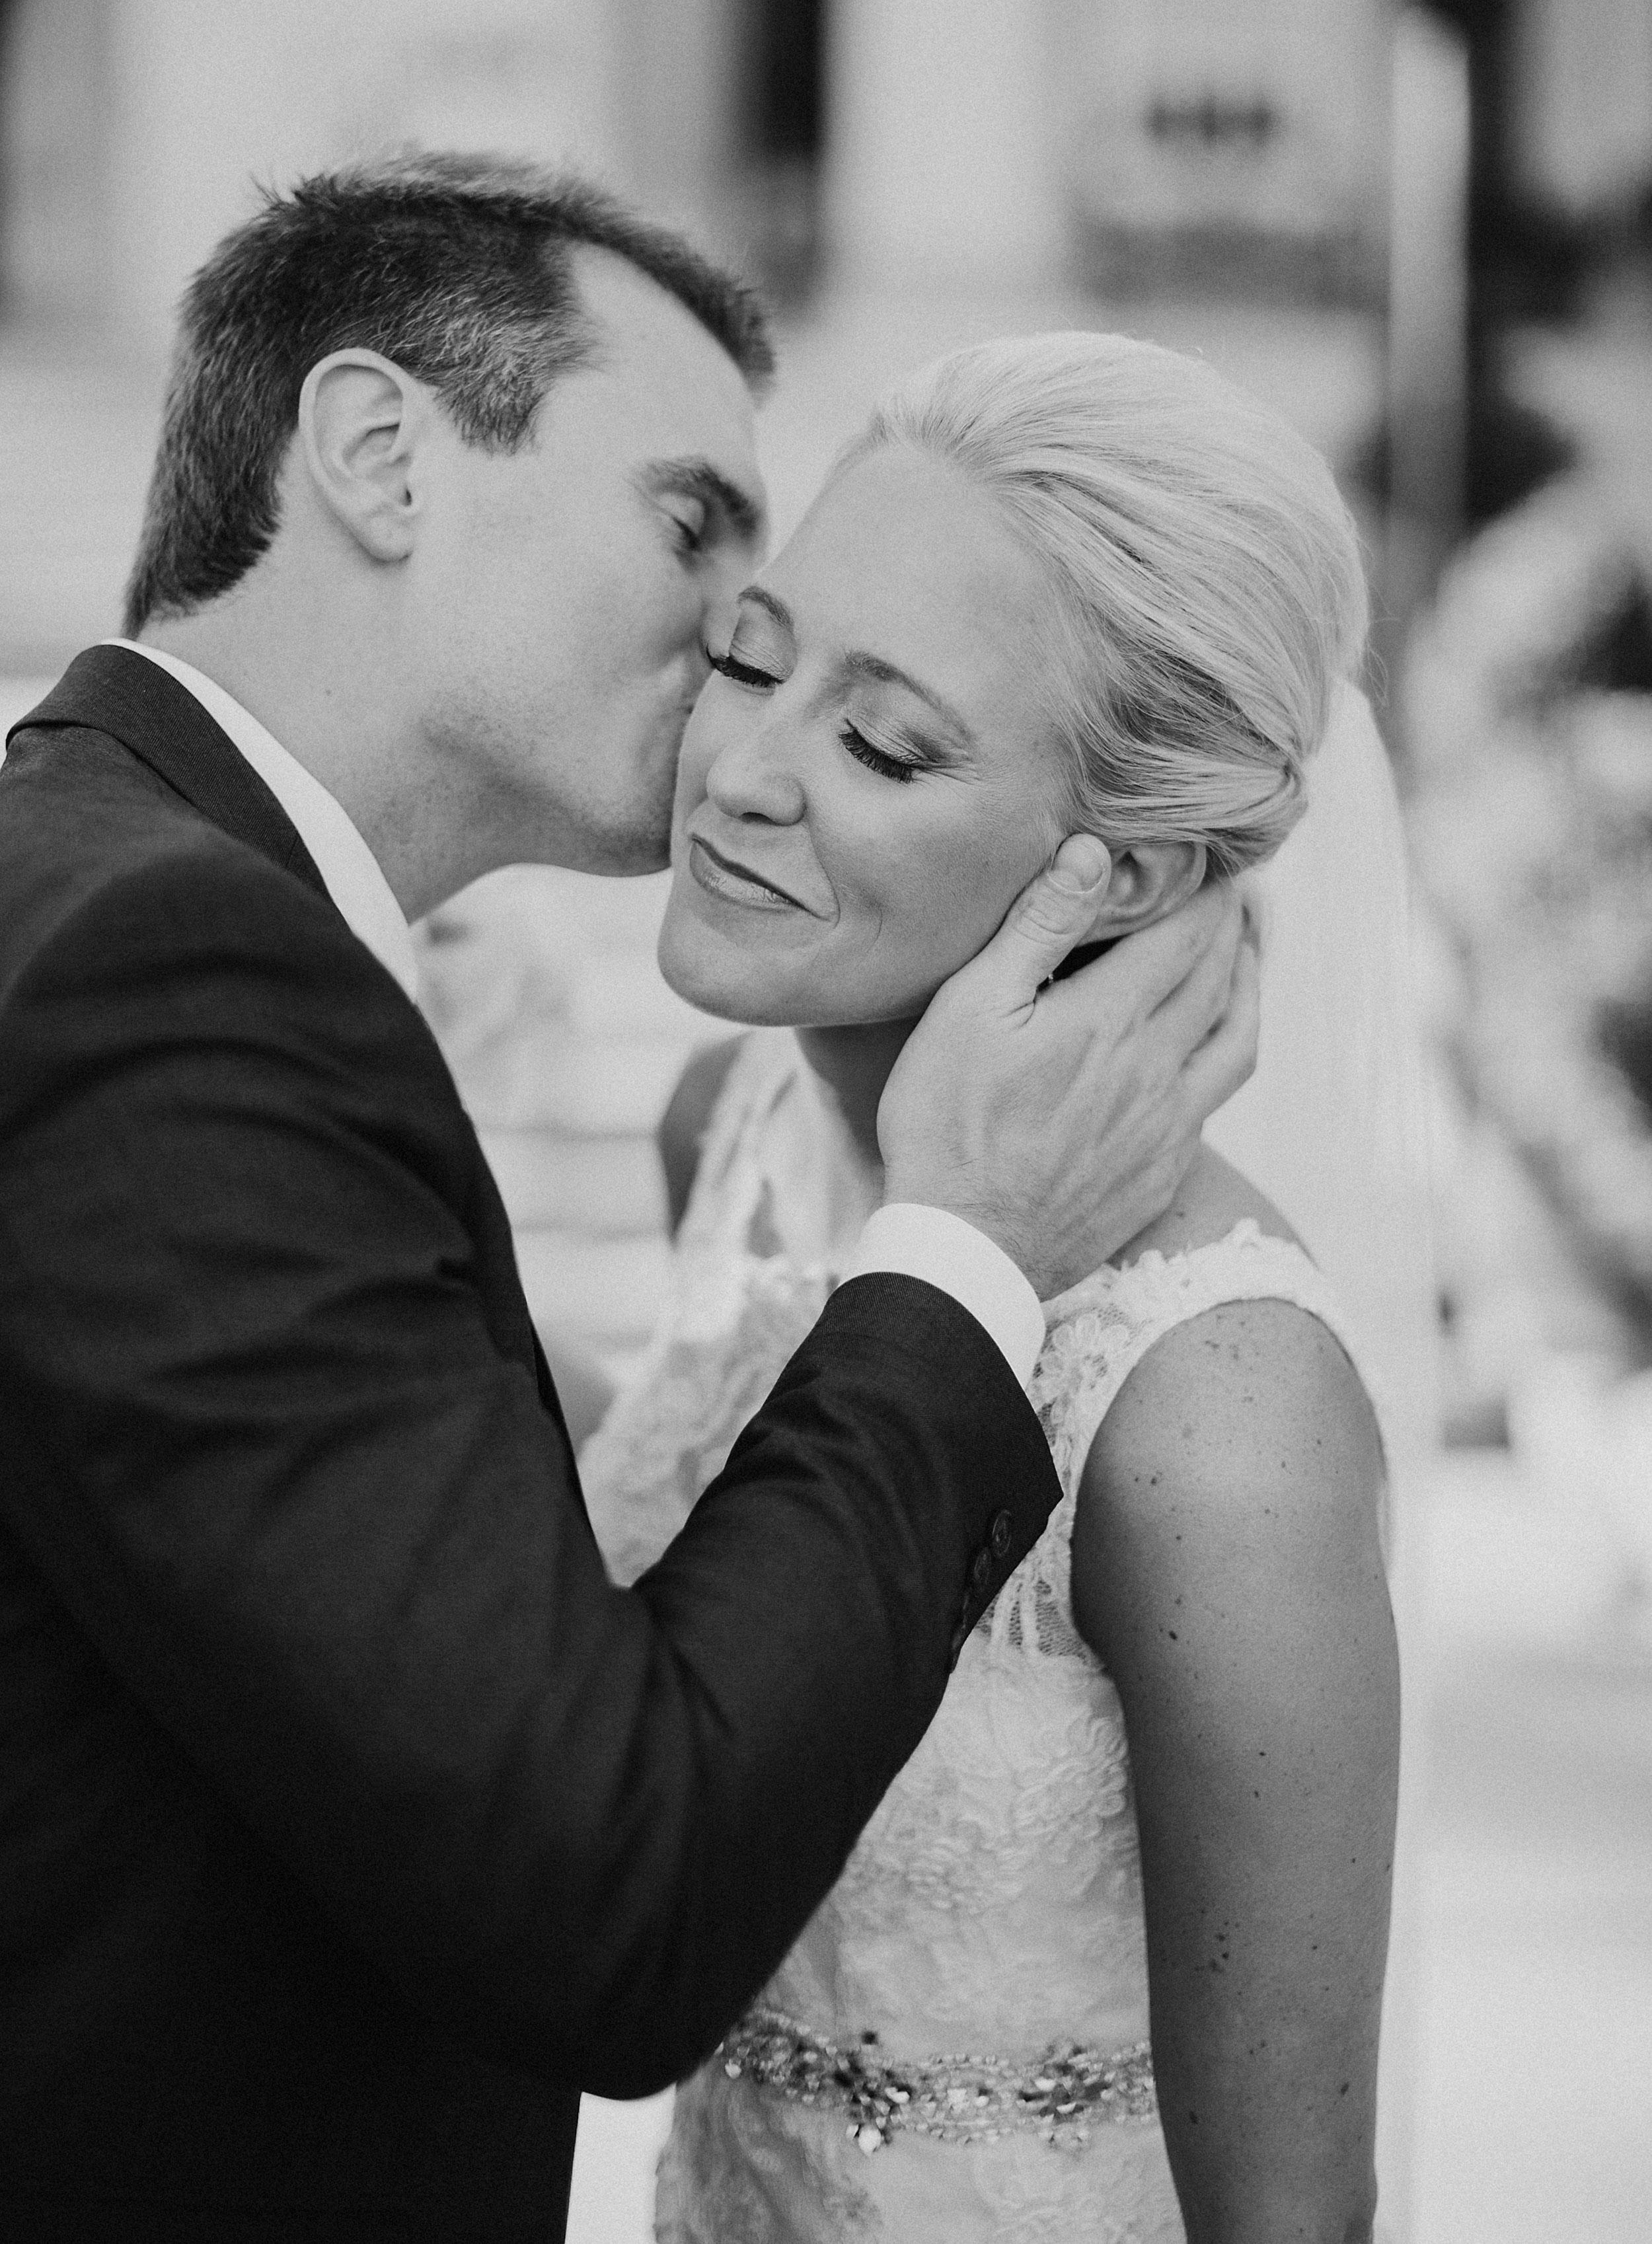 olmsted-wedding-louisville-kentucky-035.JPG